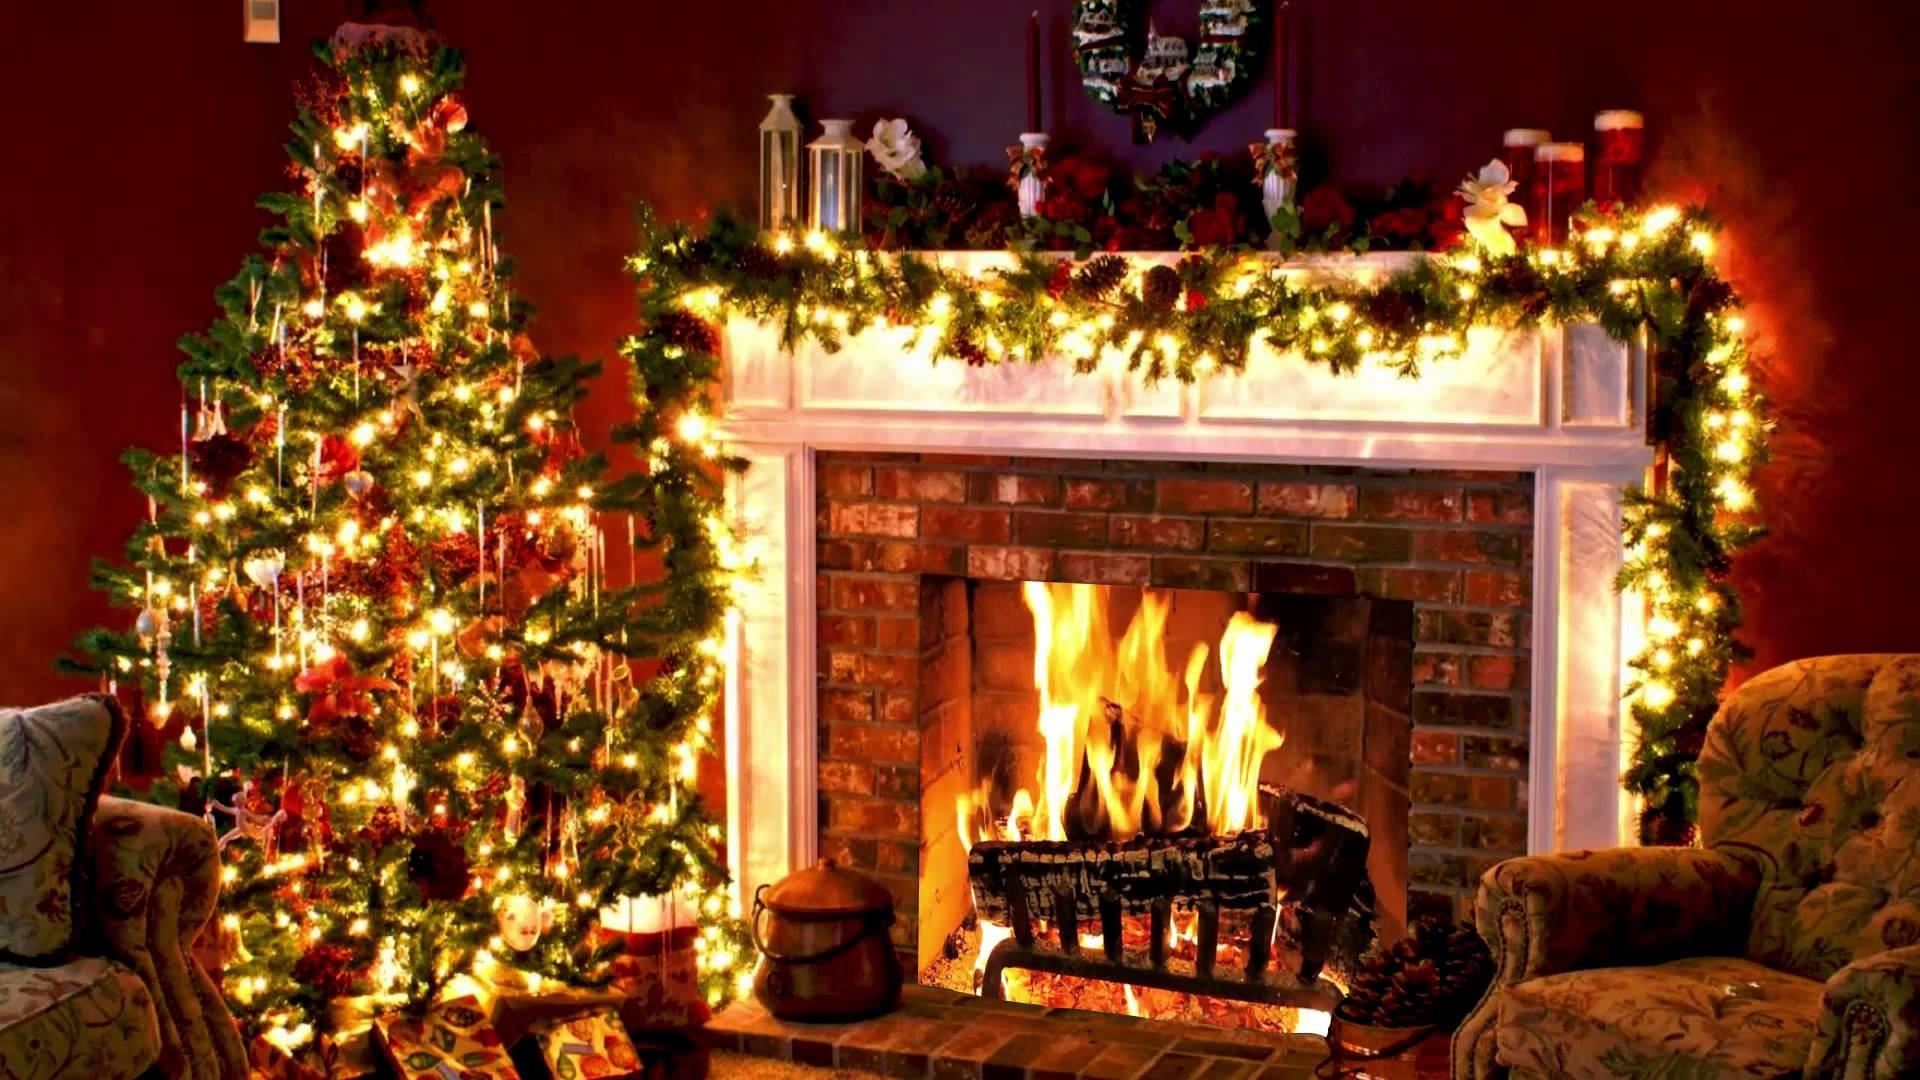 Free Christmas Fireplace Screensaver  Christmas Fireplace Background ·① WallpaperTag